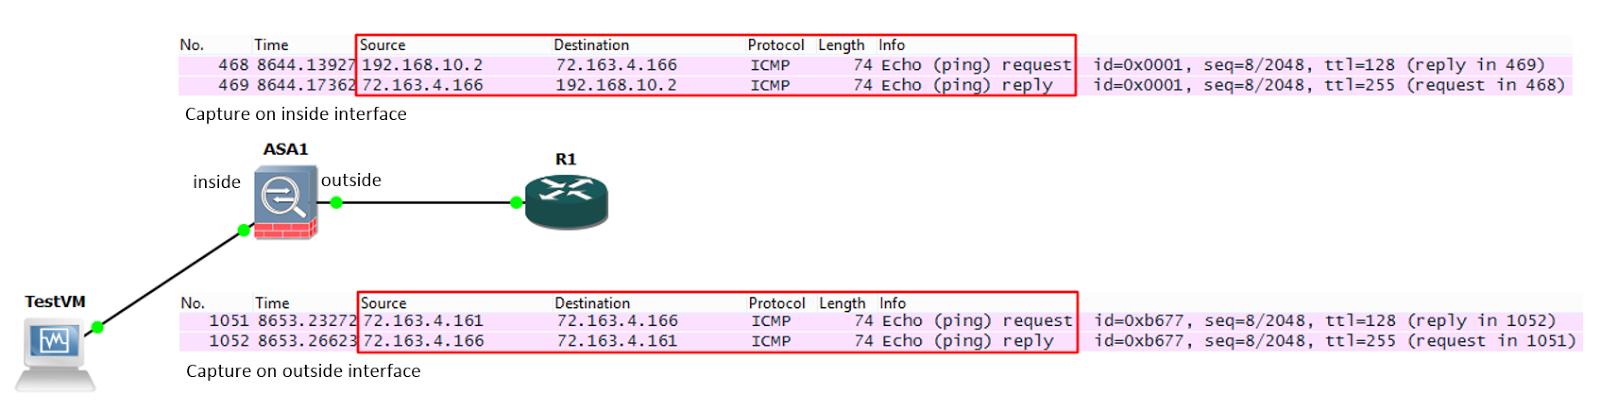 PacketFlow I/O: ASA pre-8 3 vs post-8 3 NAT explained